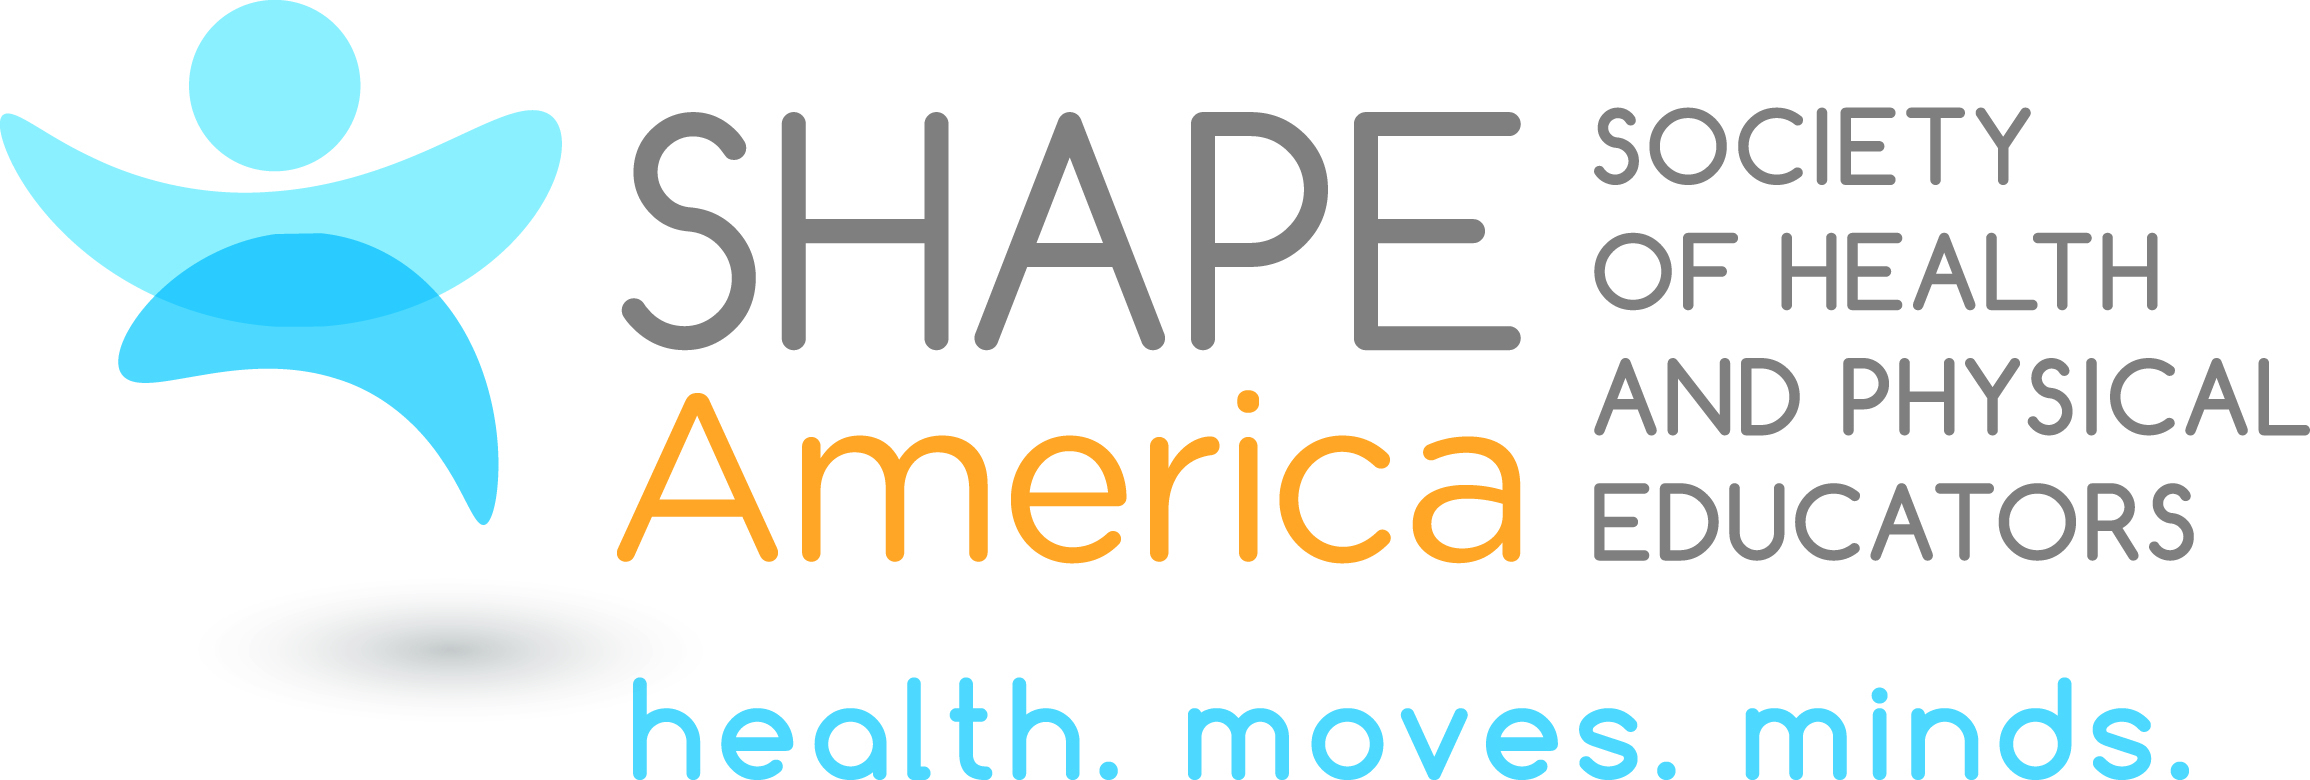 SHAPE-Logo.jpg#asset:4577